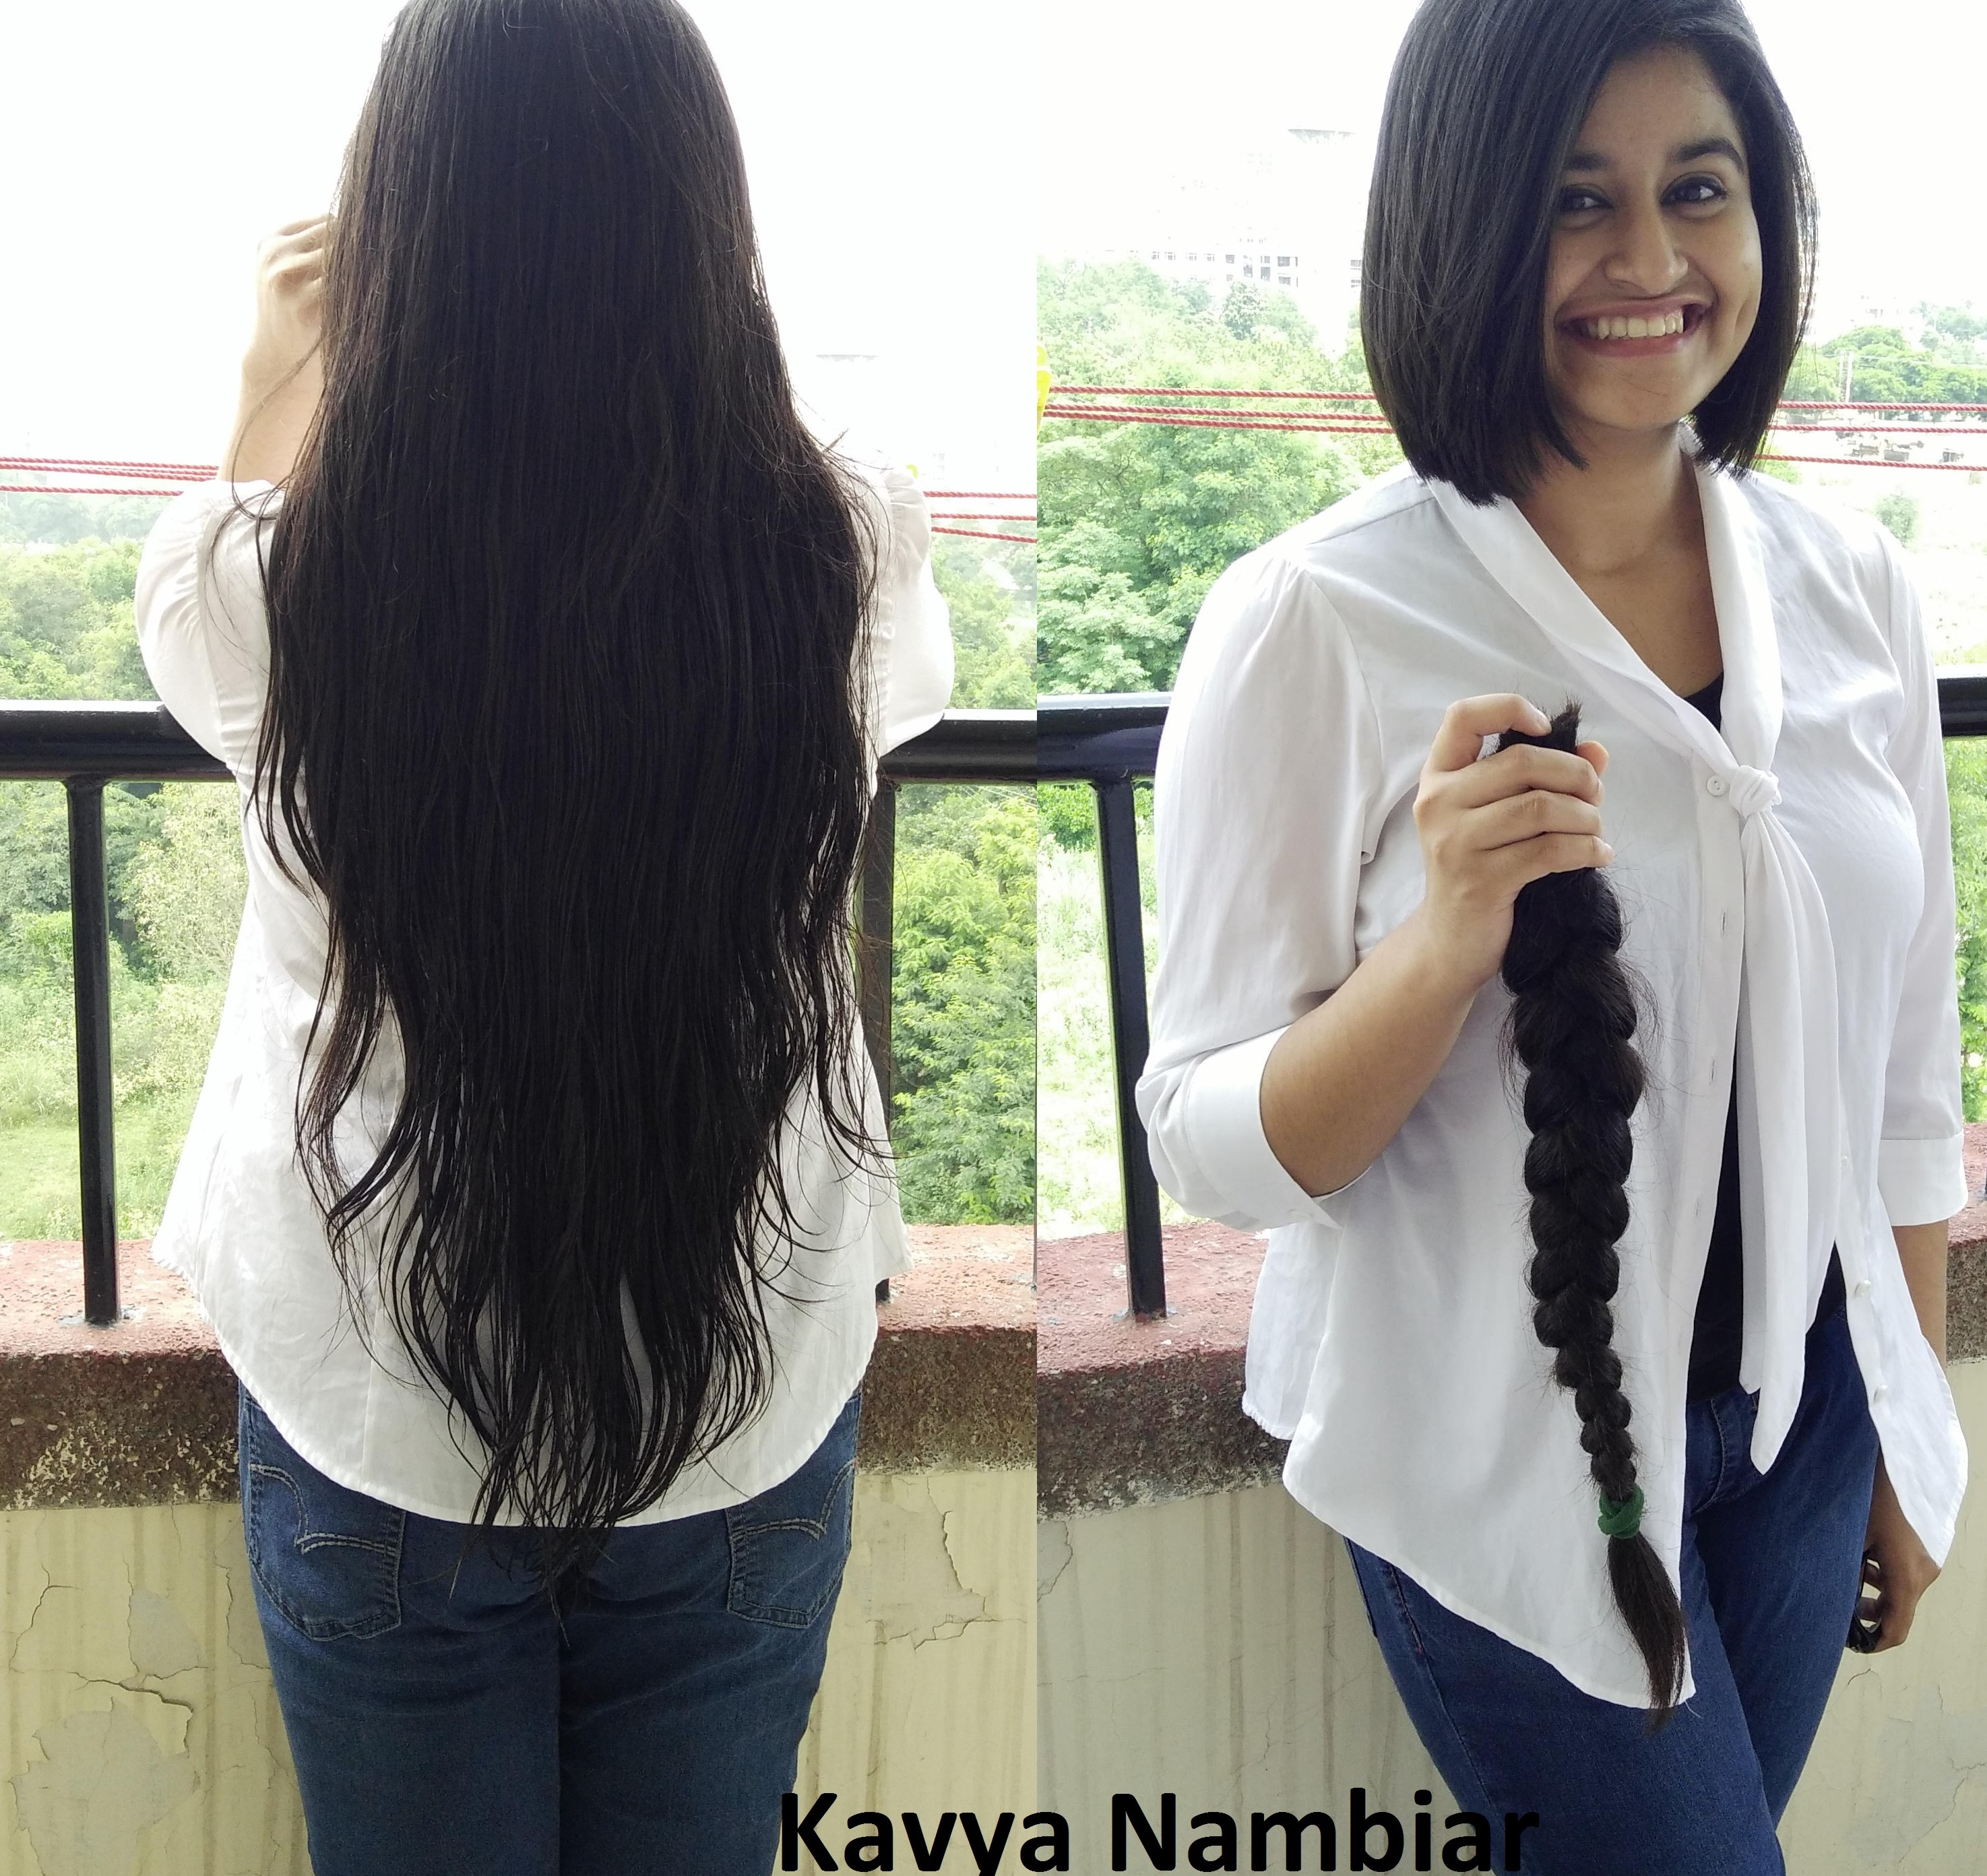 Kavya Nambiar